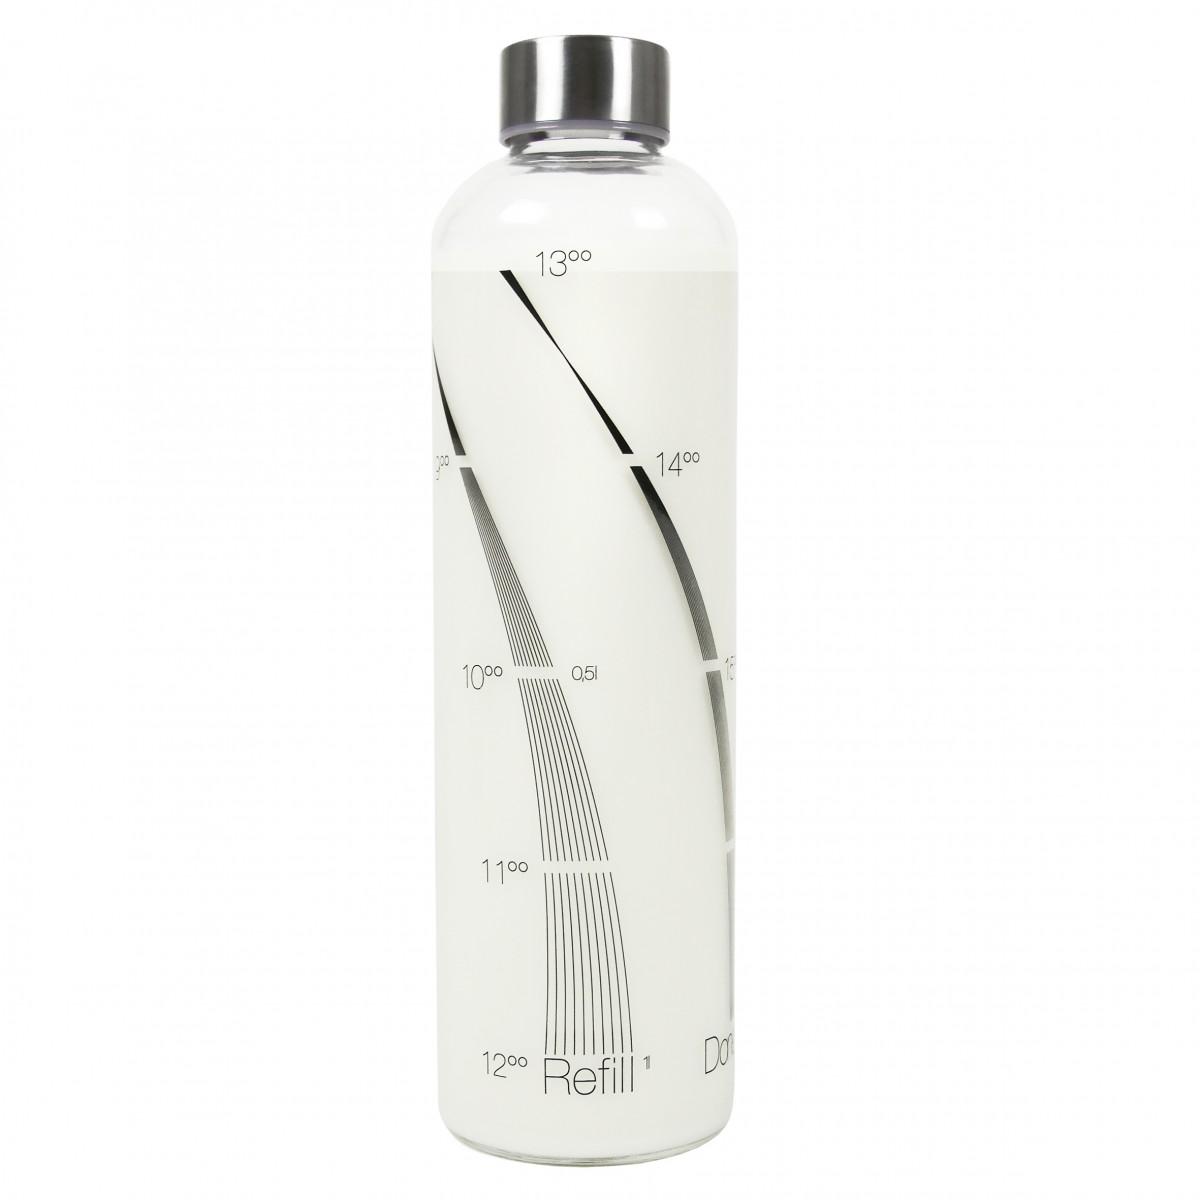 drinkitnow trinkflasche 1 liter dekor flipper. Black Bedroom Furniture Sets. Home Design Ideas